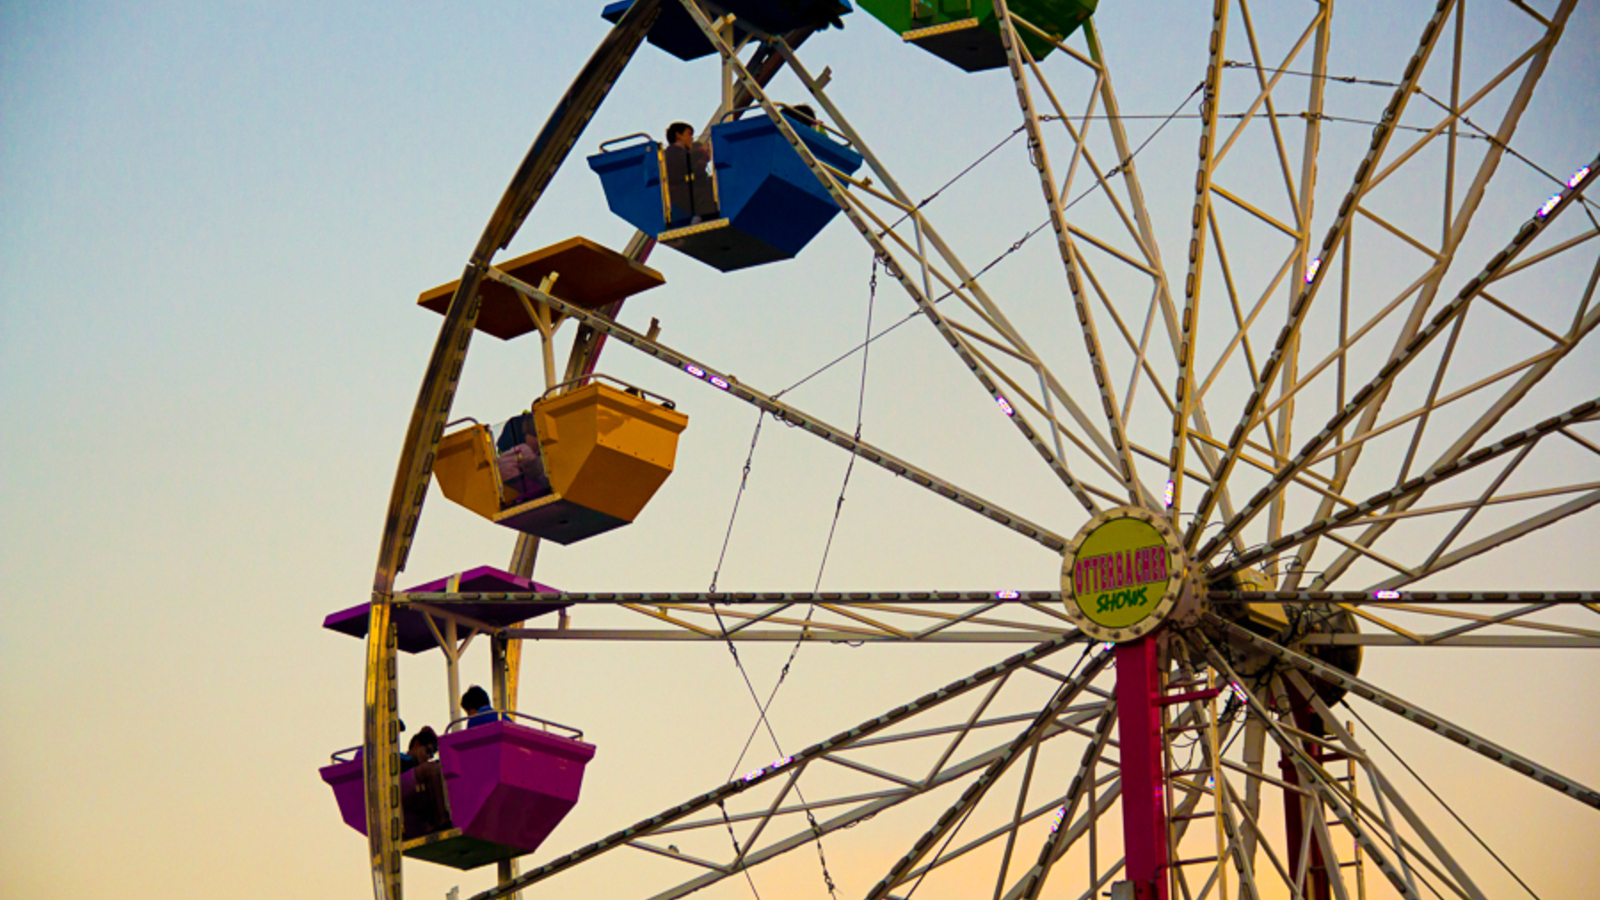 John's Island Spring Bash Ferris Wheel